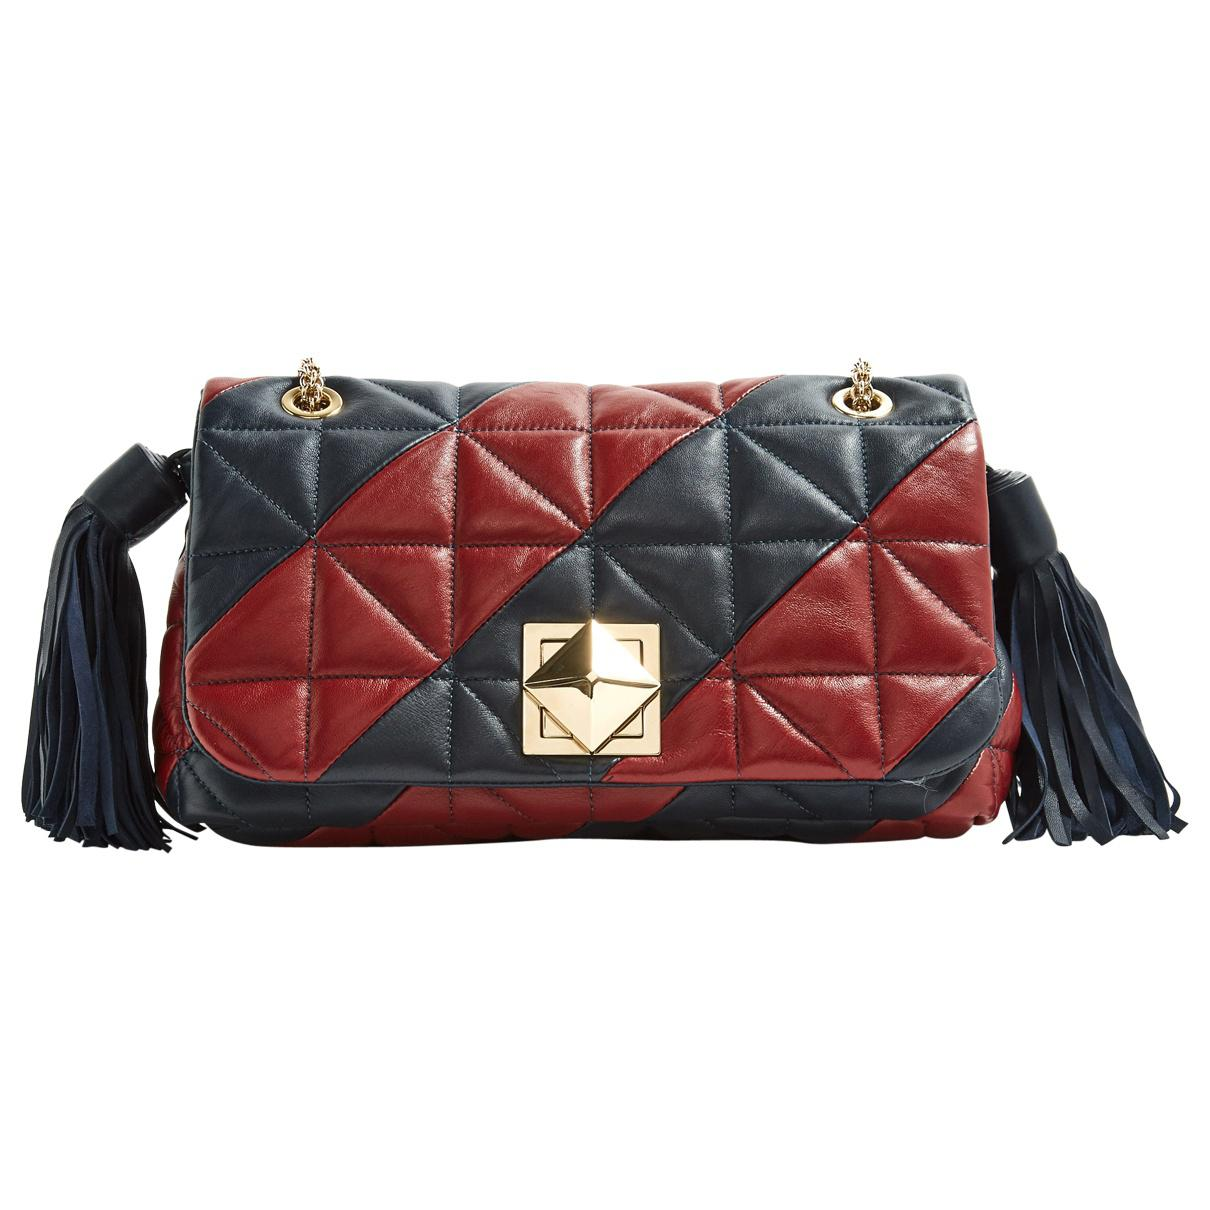 Pre-owned - Leather crossbody bag Sonia Rykiel fggXiS0